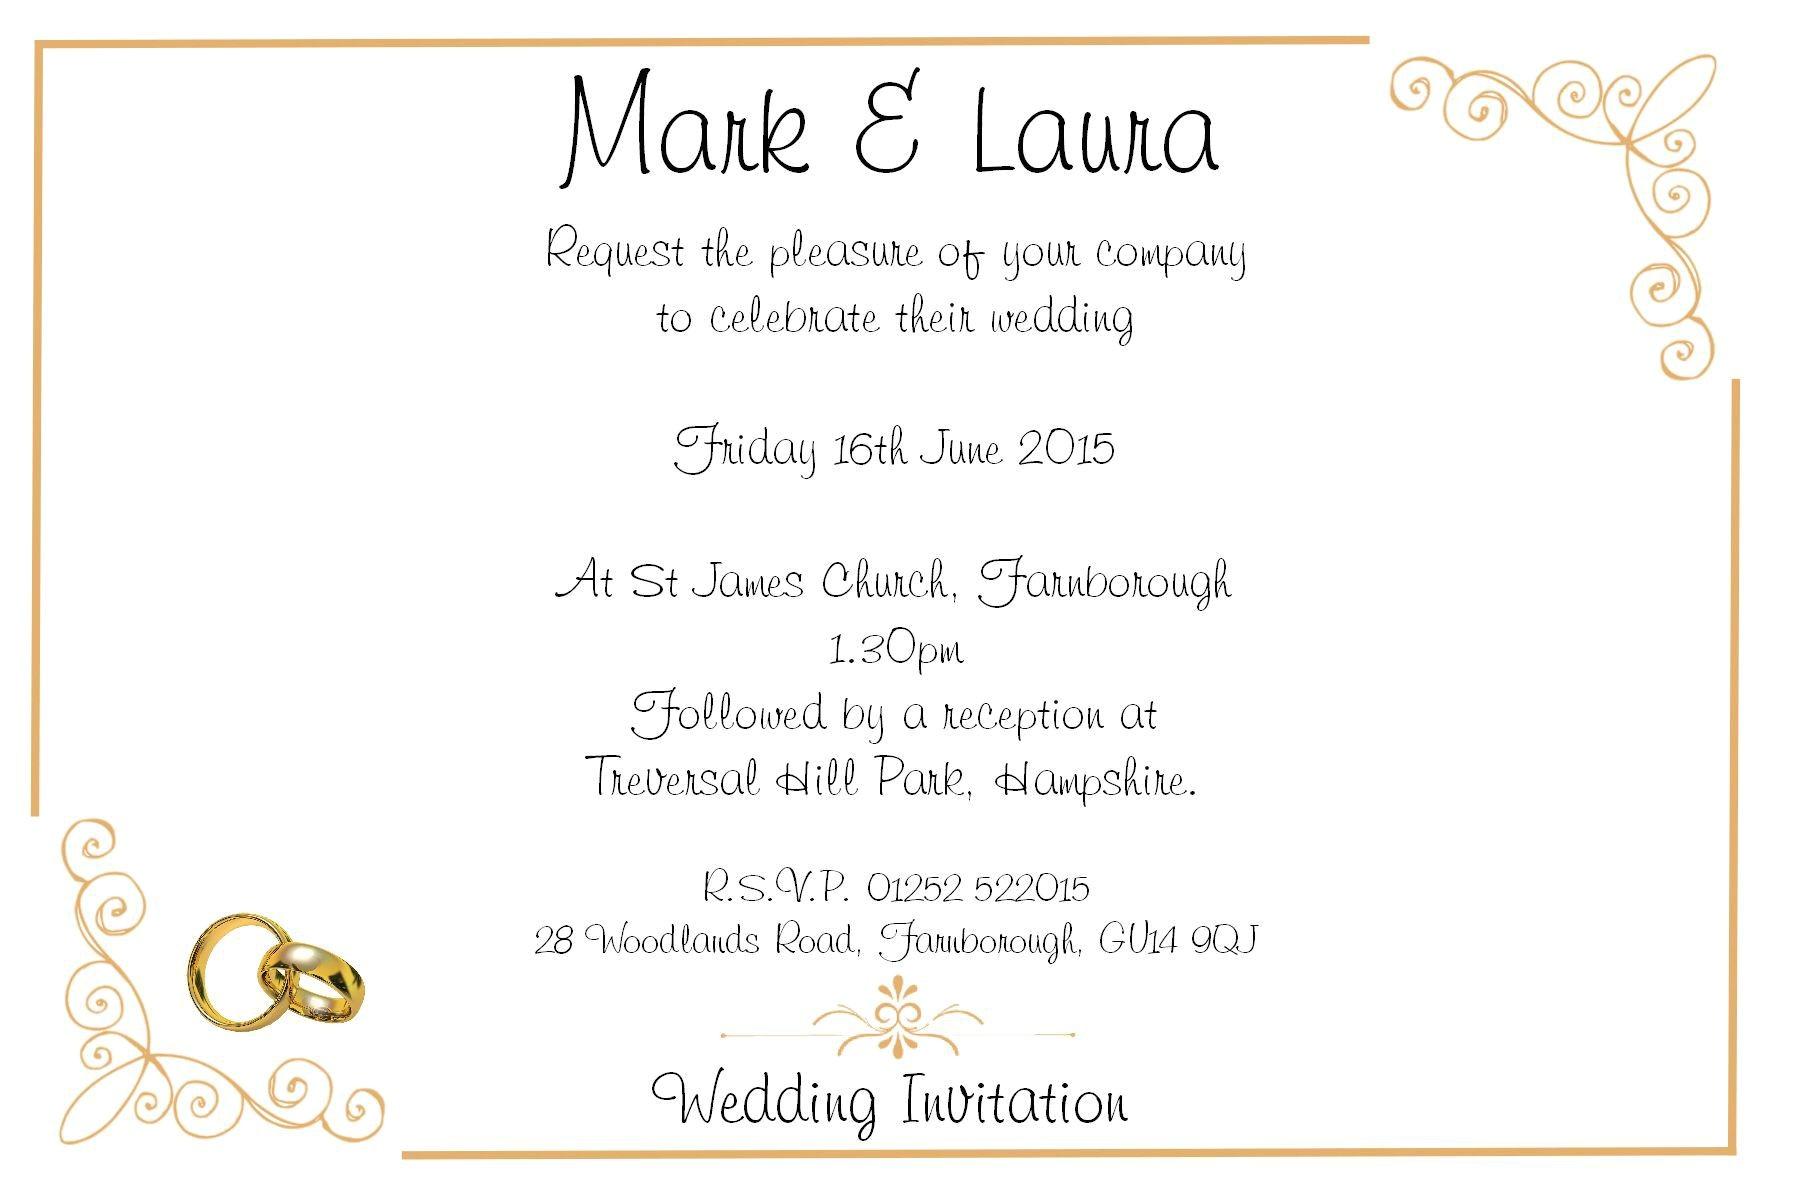 free photo collage invitation templates